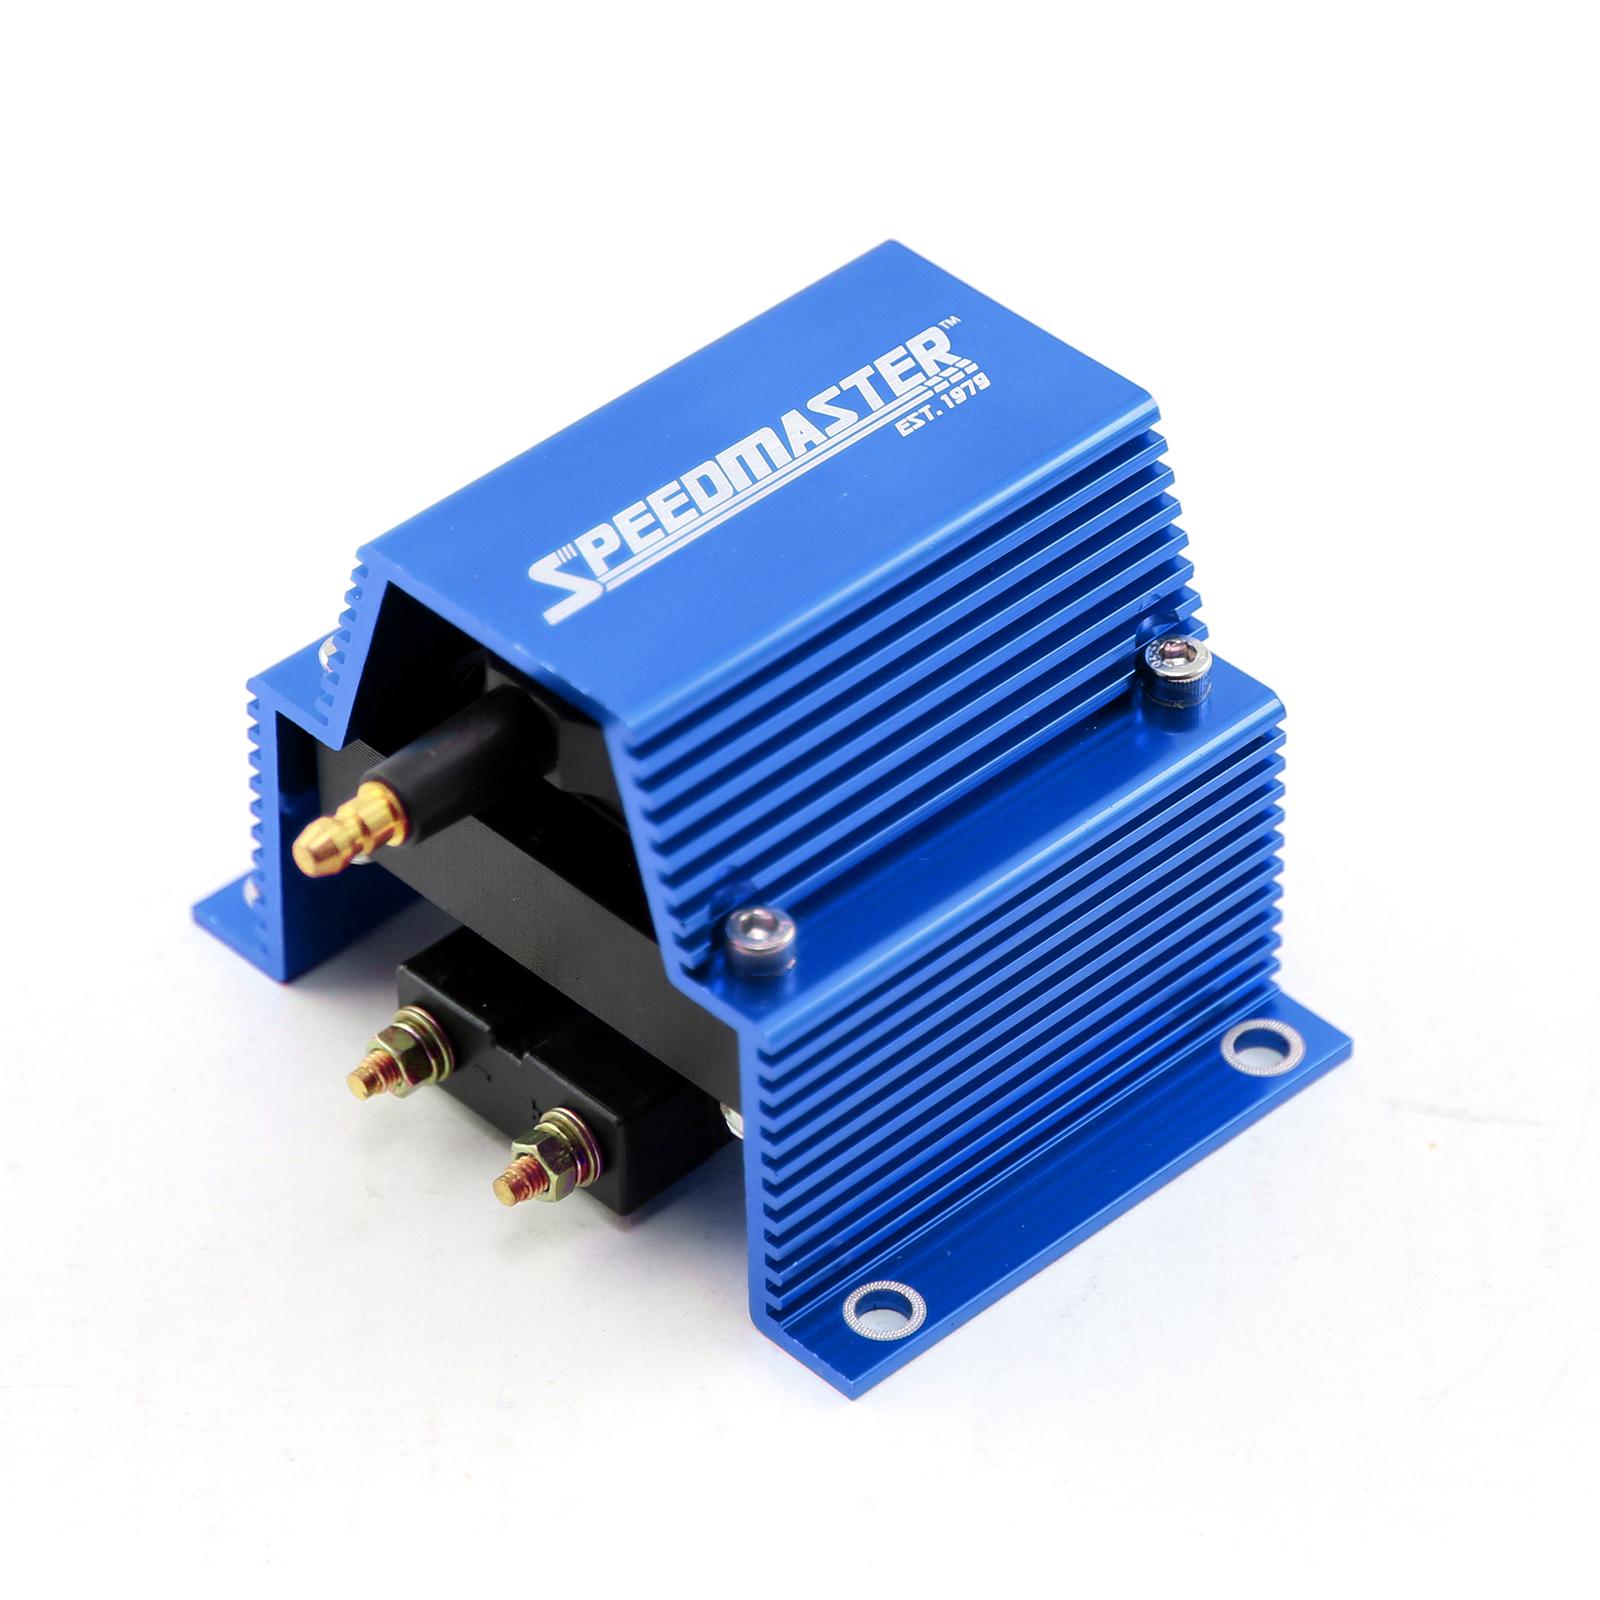 12V HO External Male E-Core Ignition Coil - Blue